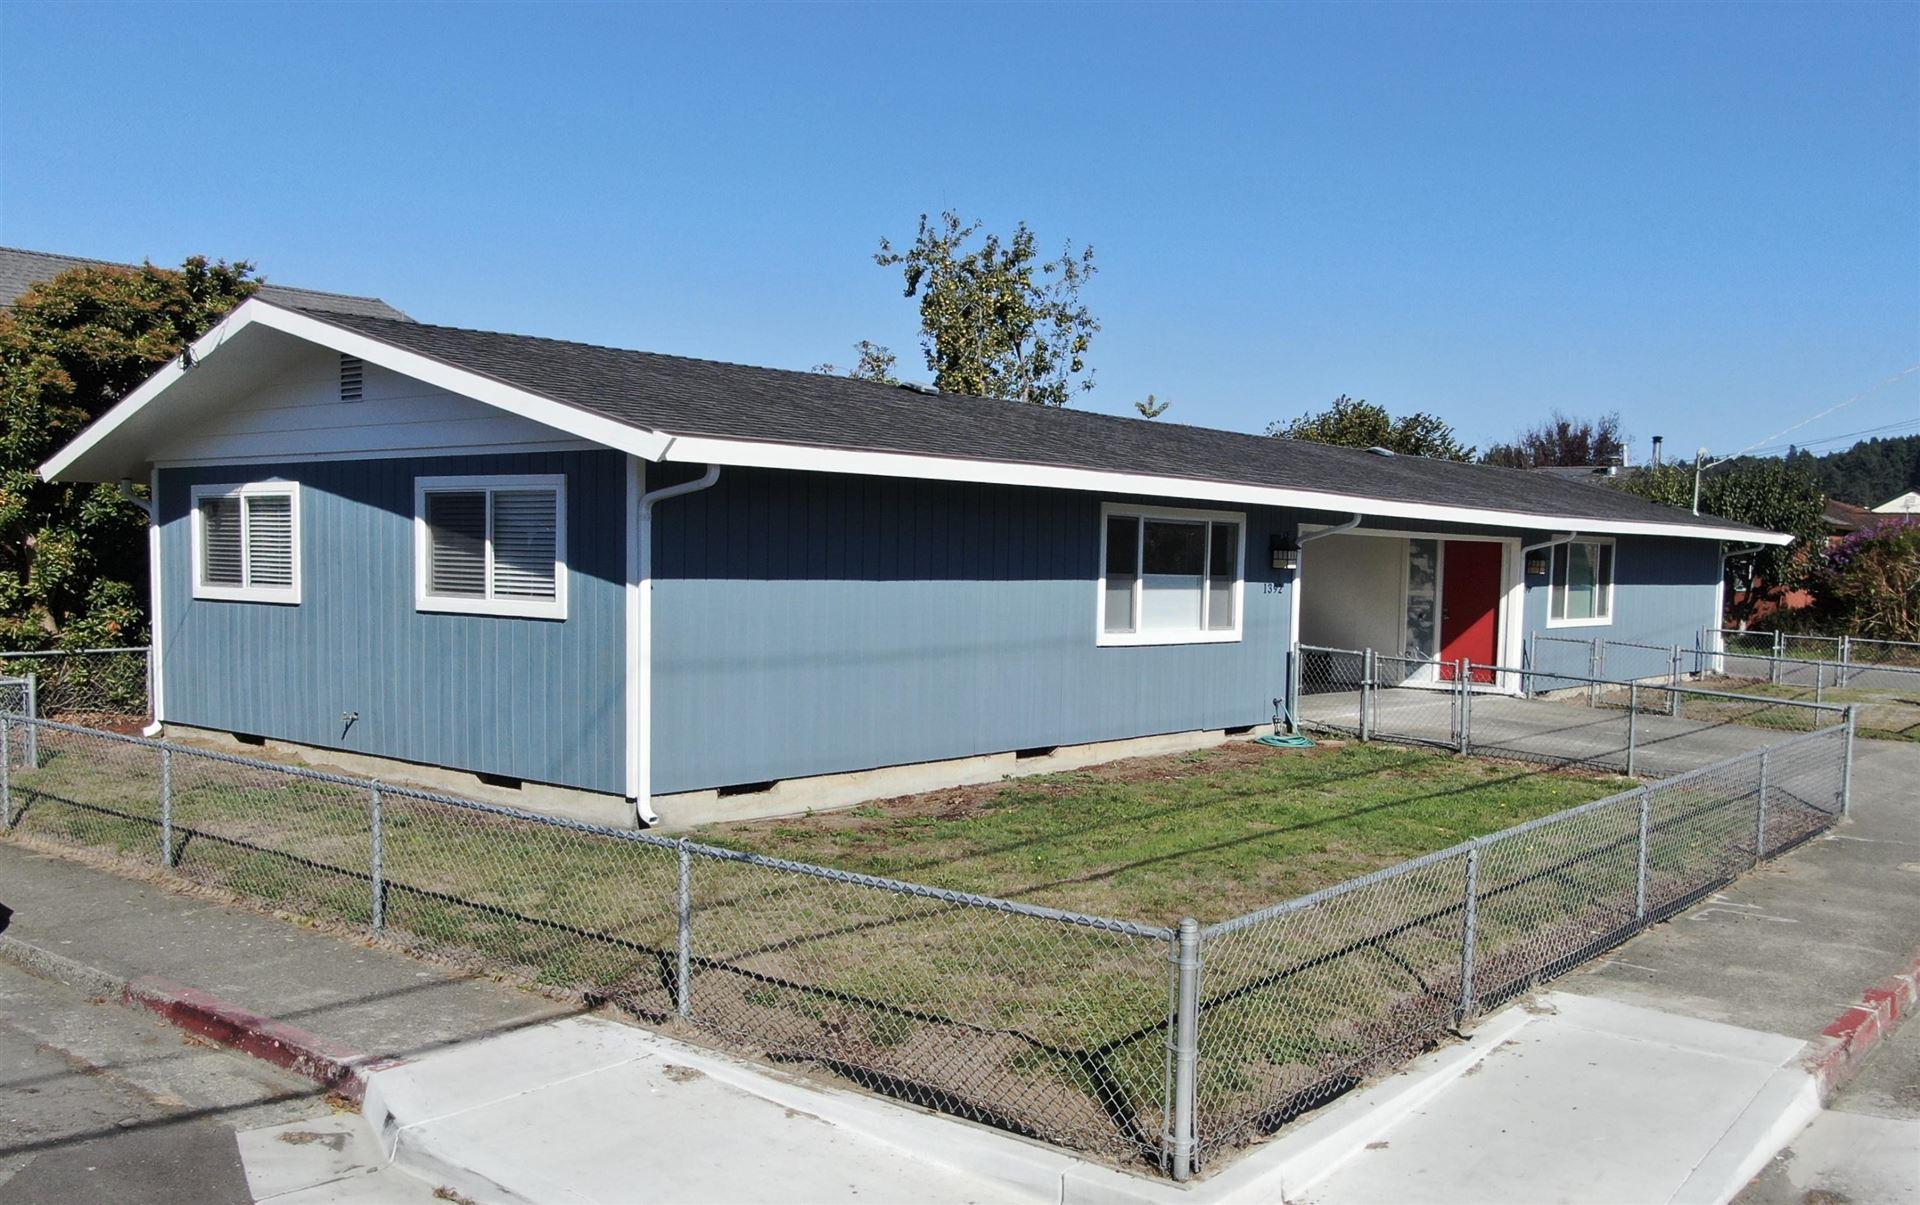 1390\/1392 Sunset Avenue, Arcata, CA 95521 - MLS#: 257601